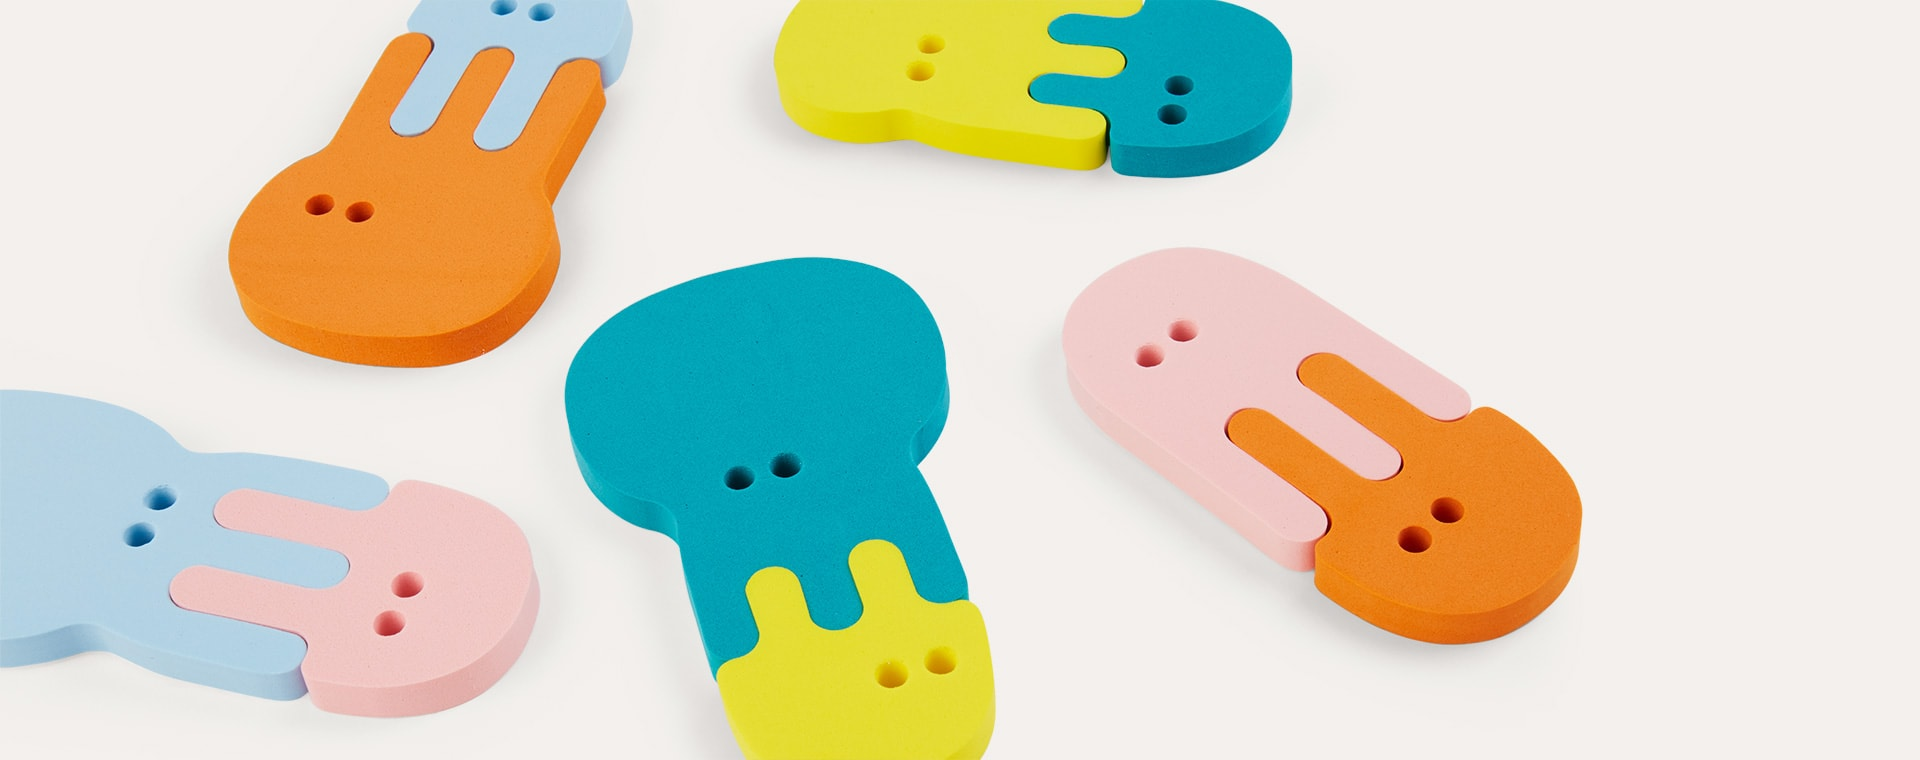 Jellyfish Quut Soft Foam Bath Puzzle